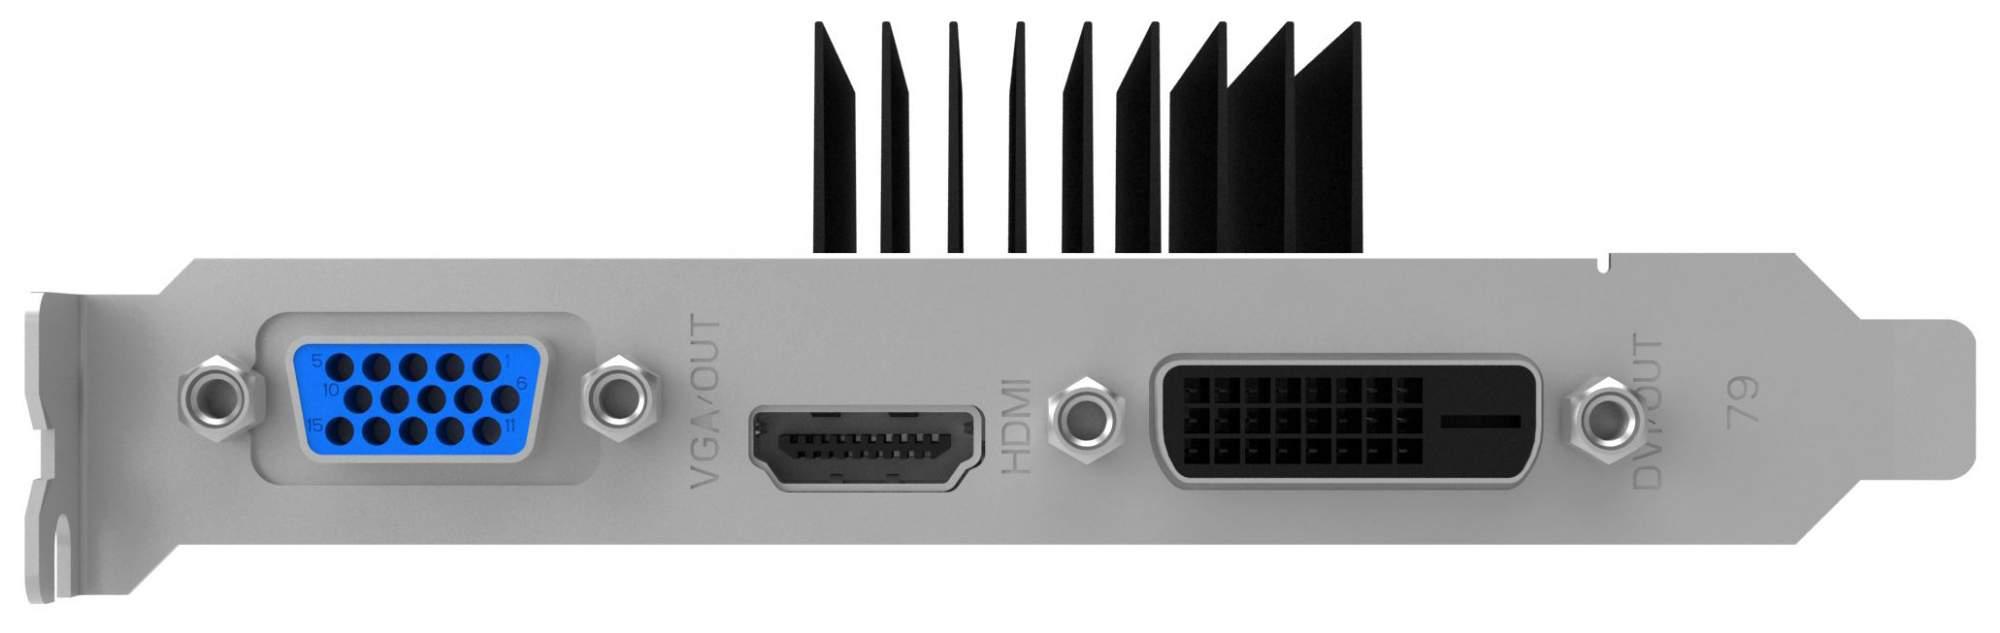 Видеокарта Palit GeForce GT 730 (PA-GT710-2GD3H)